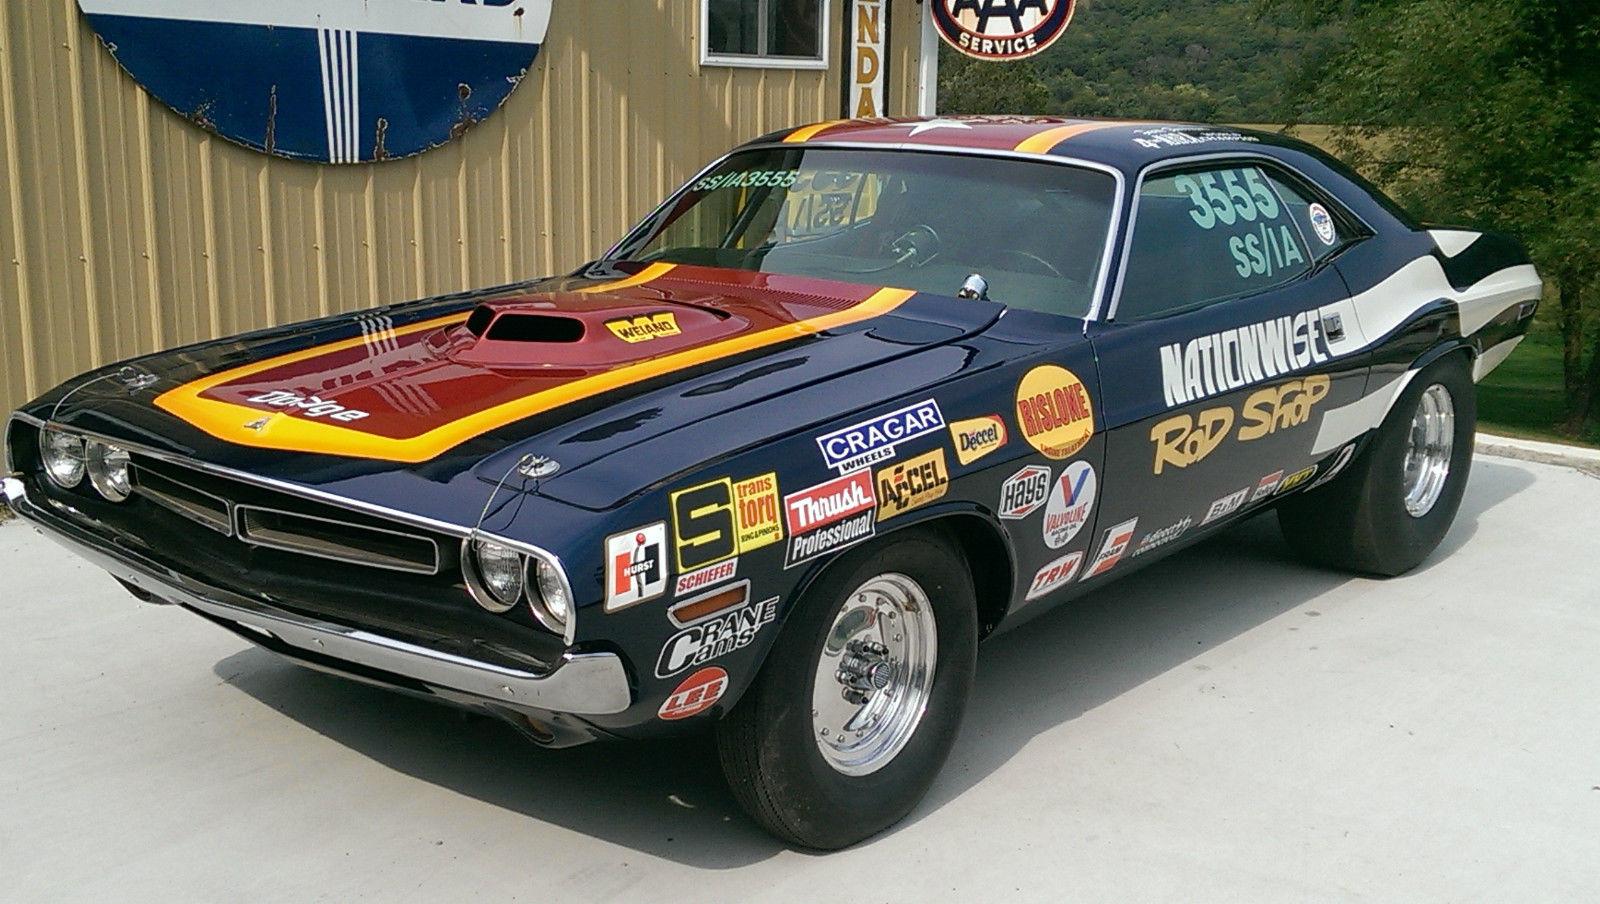 1971-Dodge-Challenger-Dave-Boertman-Rod-Shop-3qtr